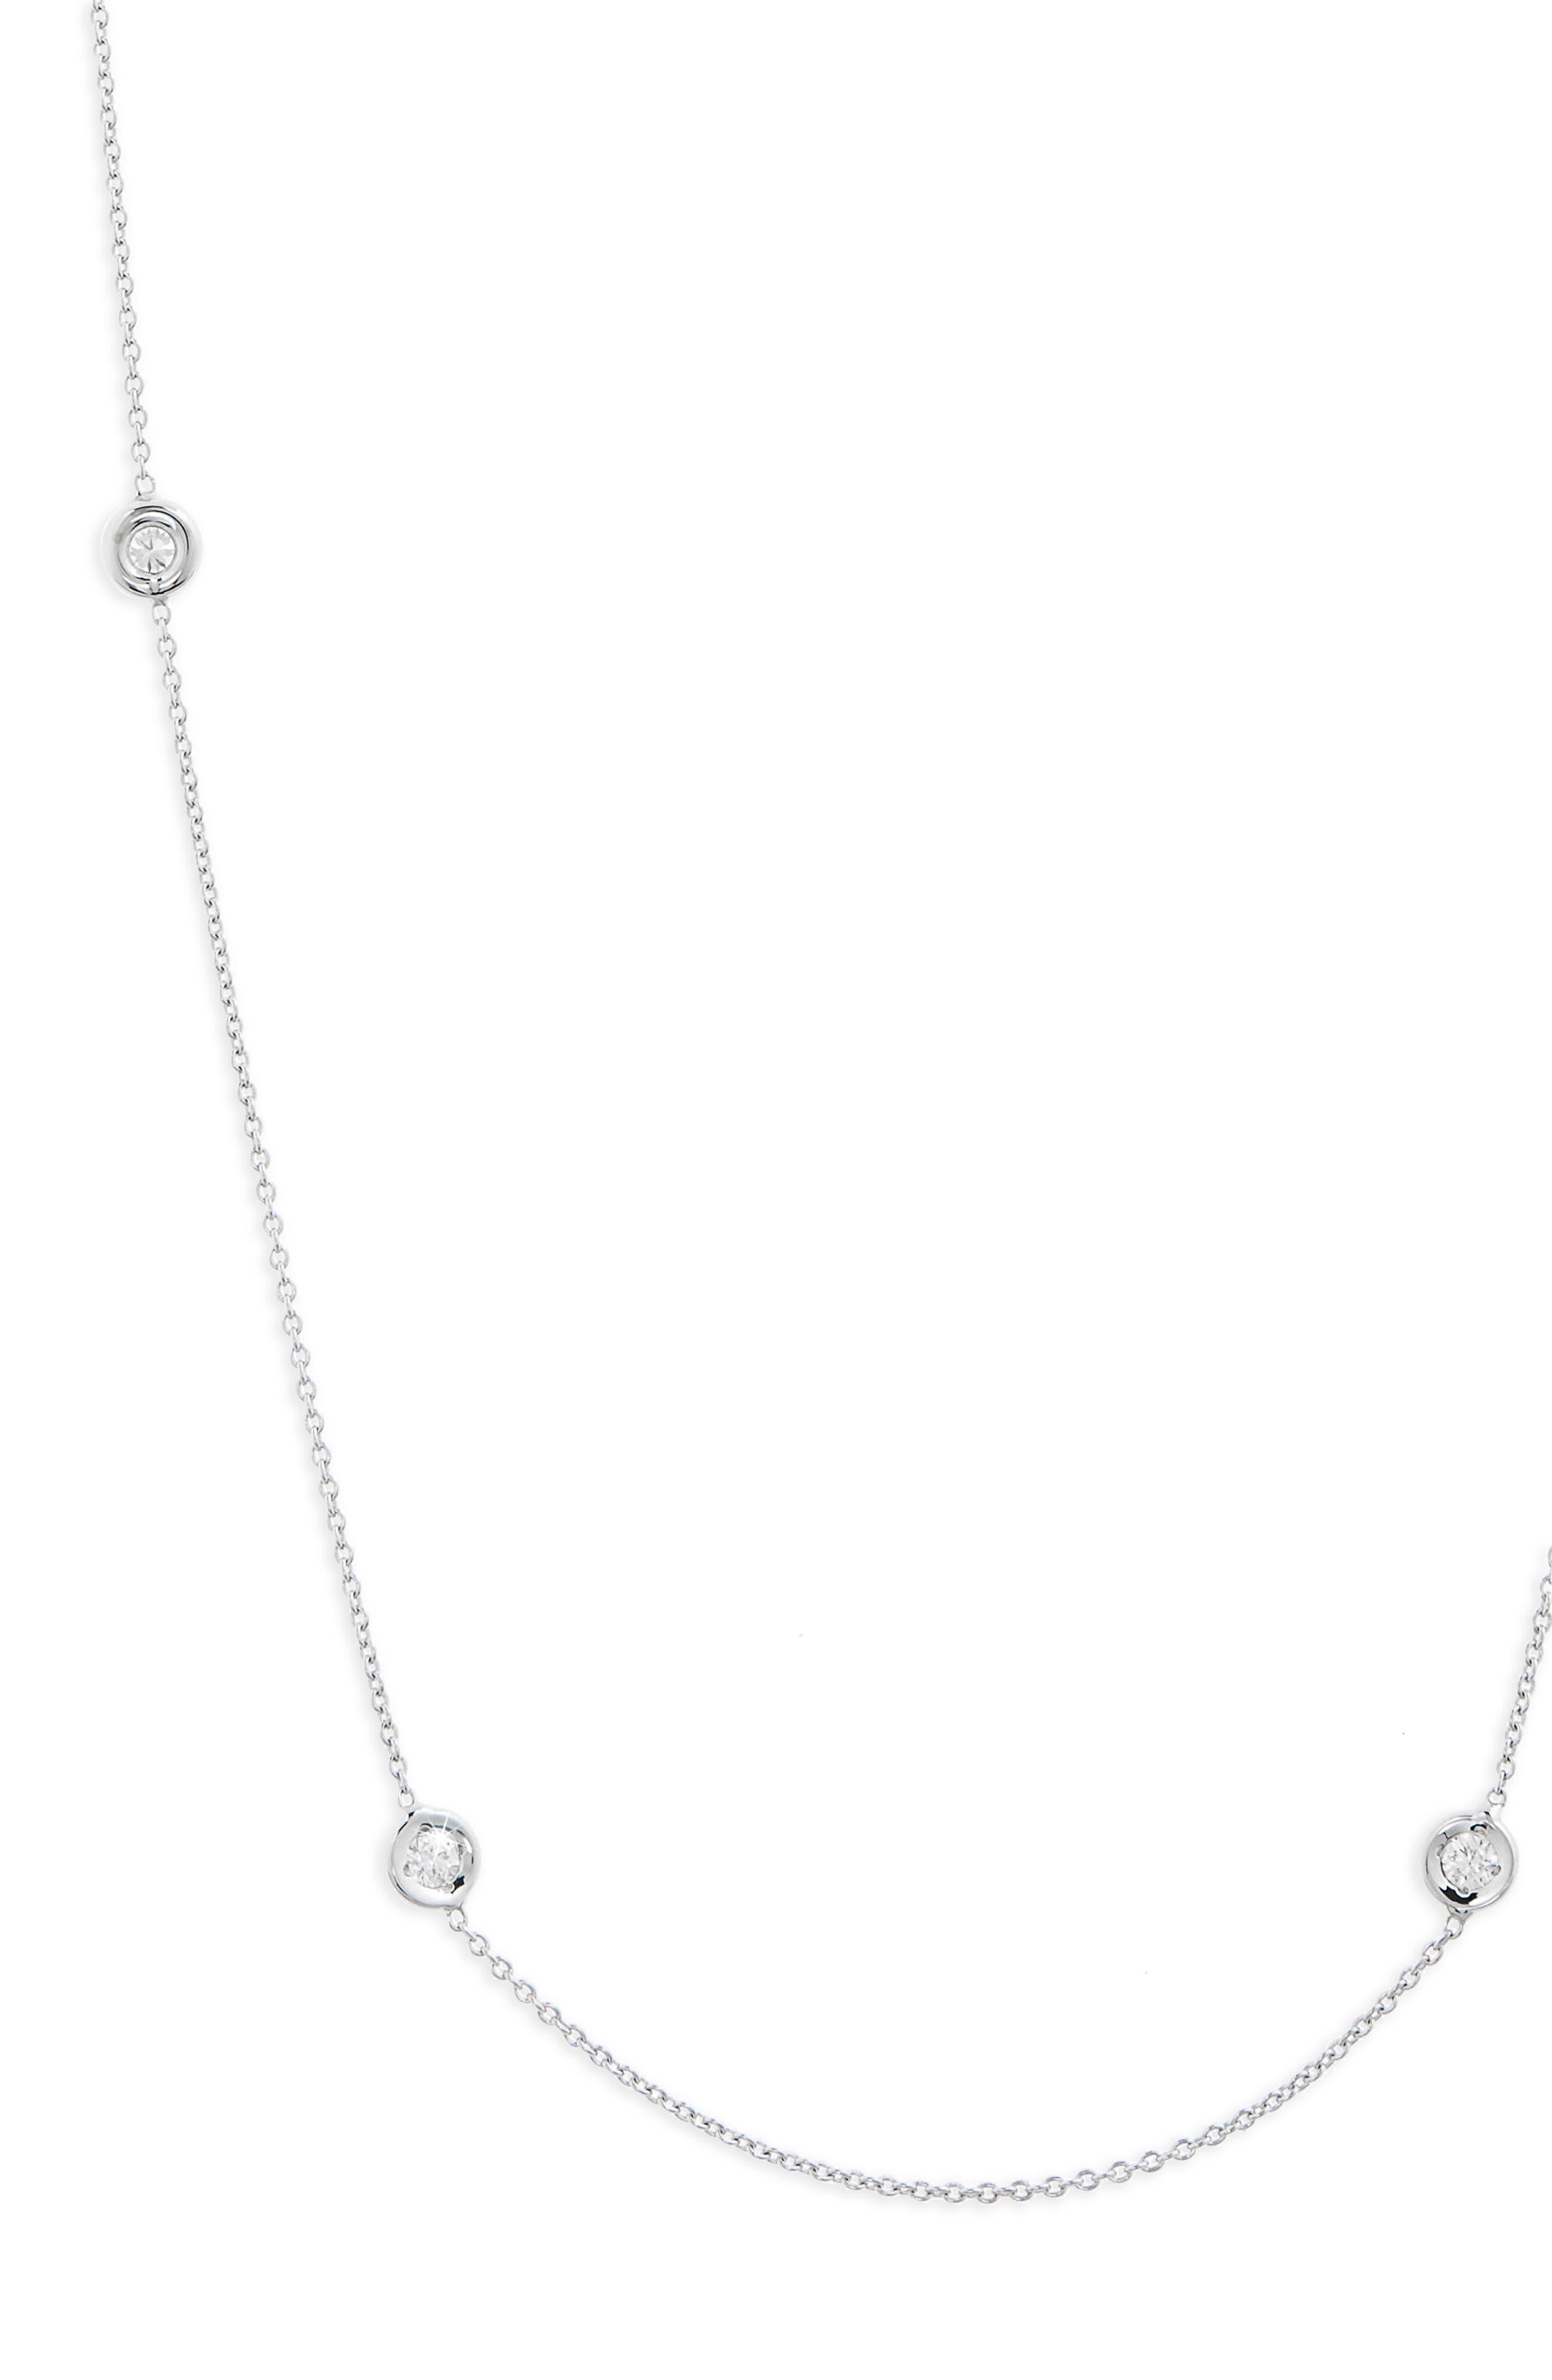 Diamond Station Necklace,                             Alternate thumbnail 3, color,